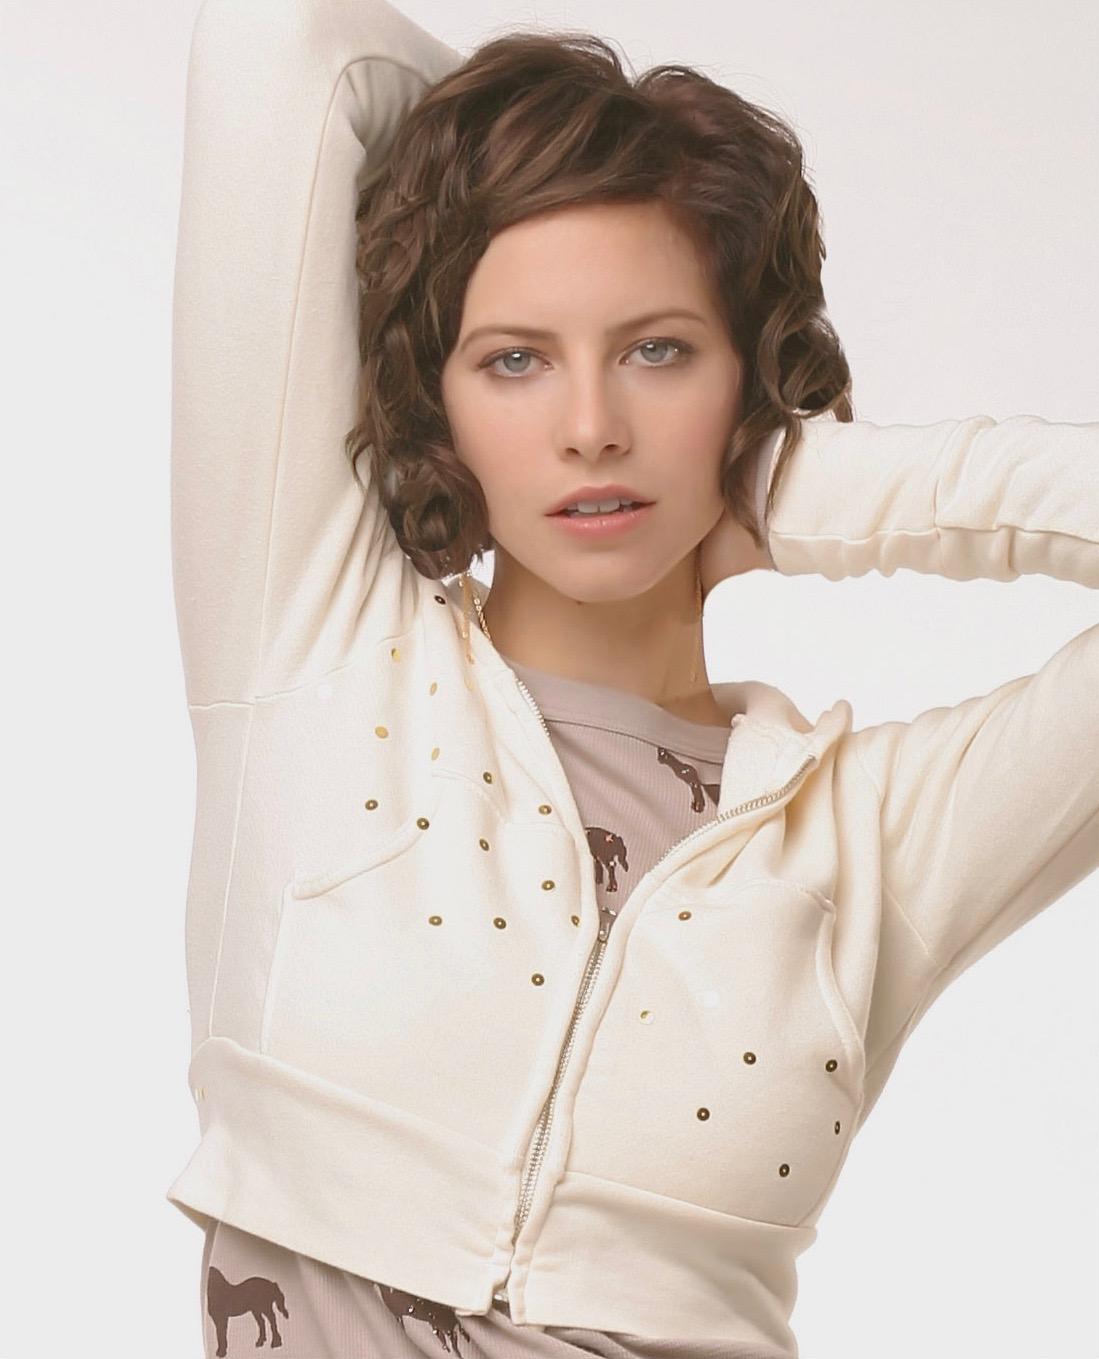 Female model Headshot in white sweater